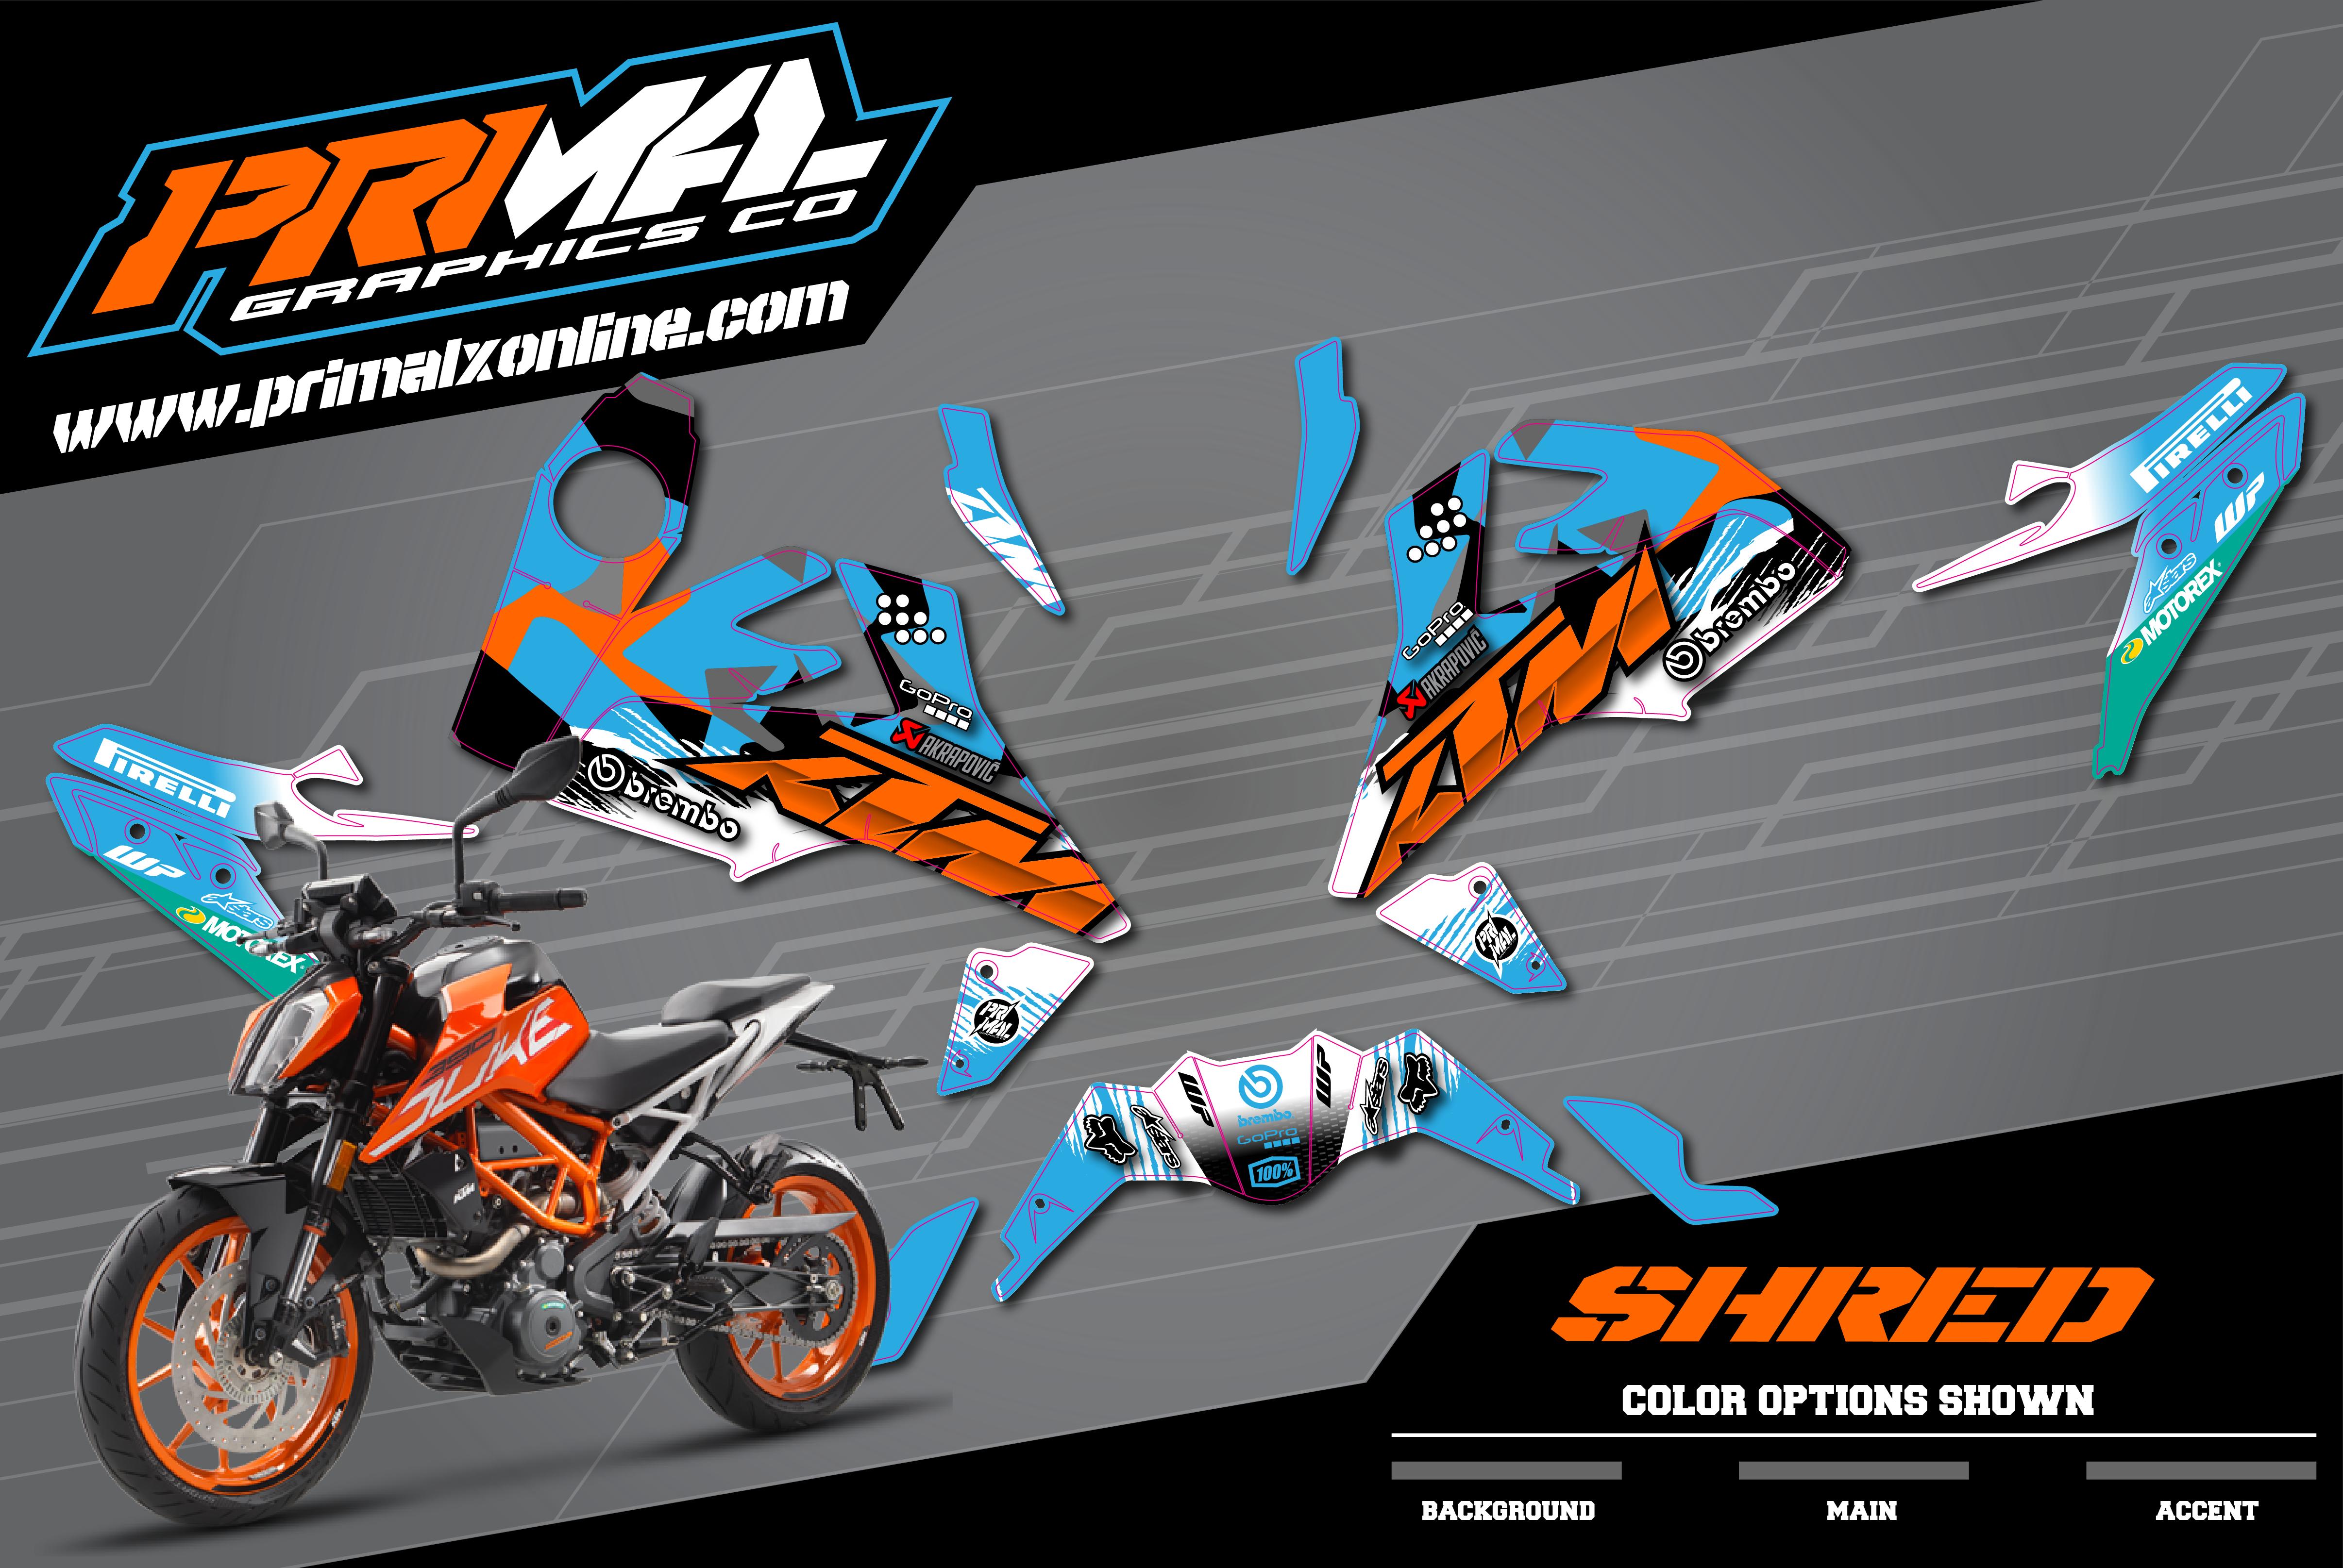 PRIMAL-X-MOTORSPORTS-PRIMAL-GRAPHICS-CO-KTM-DUKE-390-BIKELIFE-CHARMCITY-KINGS-MX-GRAPHICS-MX-DECALS-01